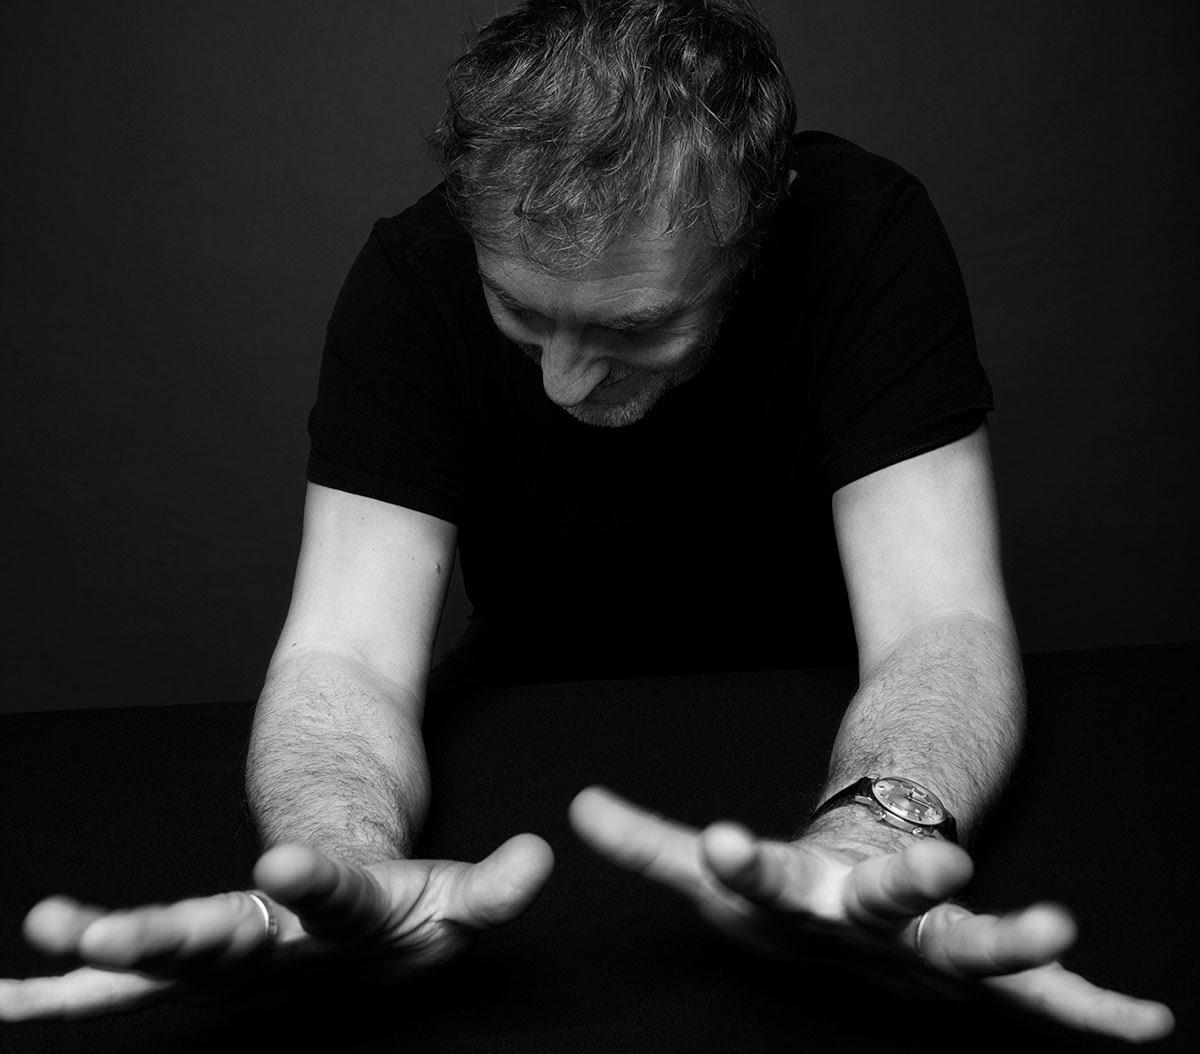 Yann Tiersen de volta a Portugal